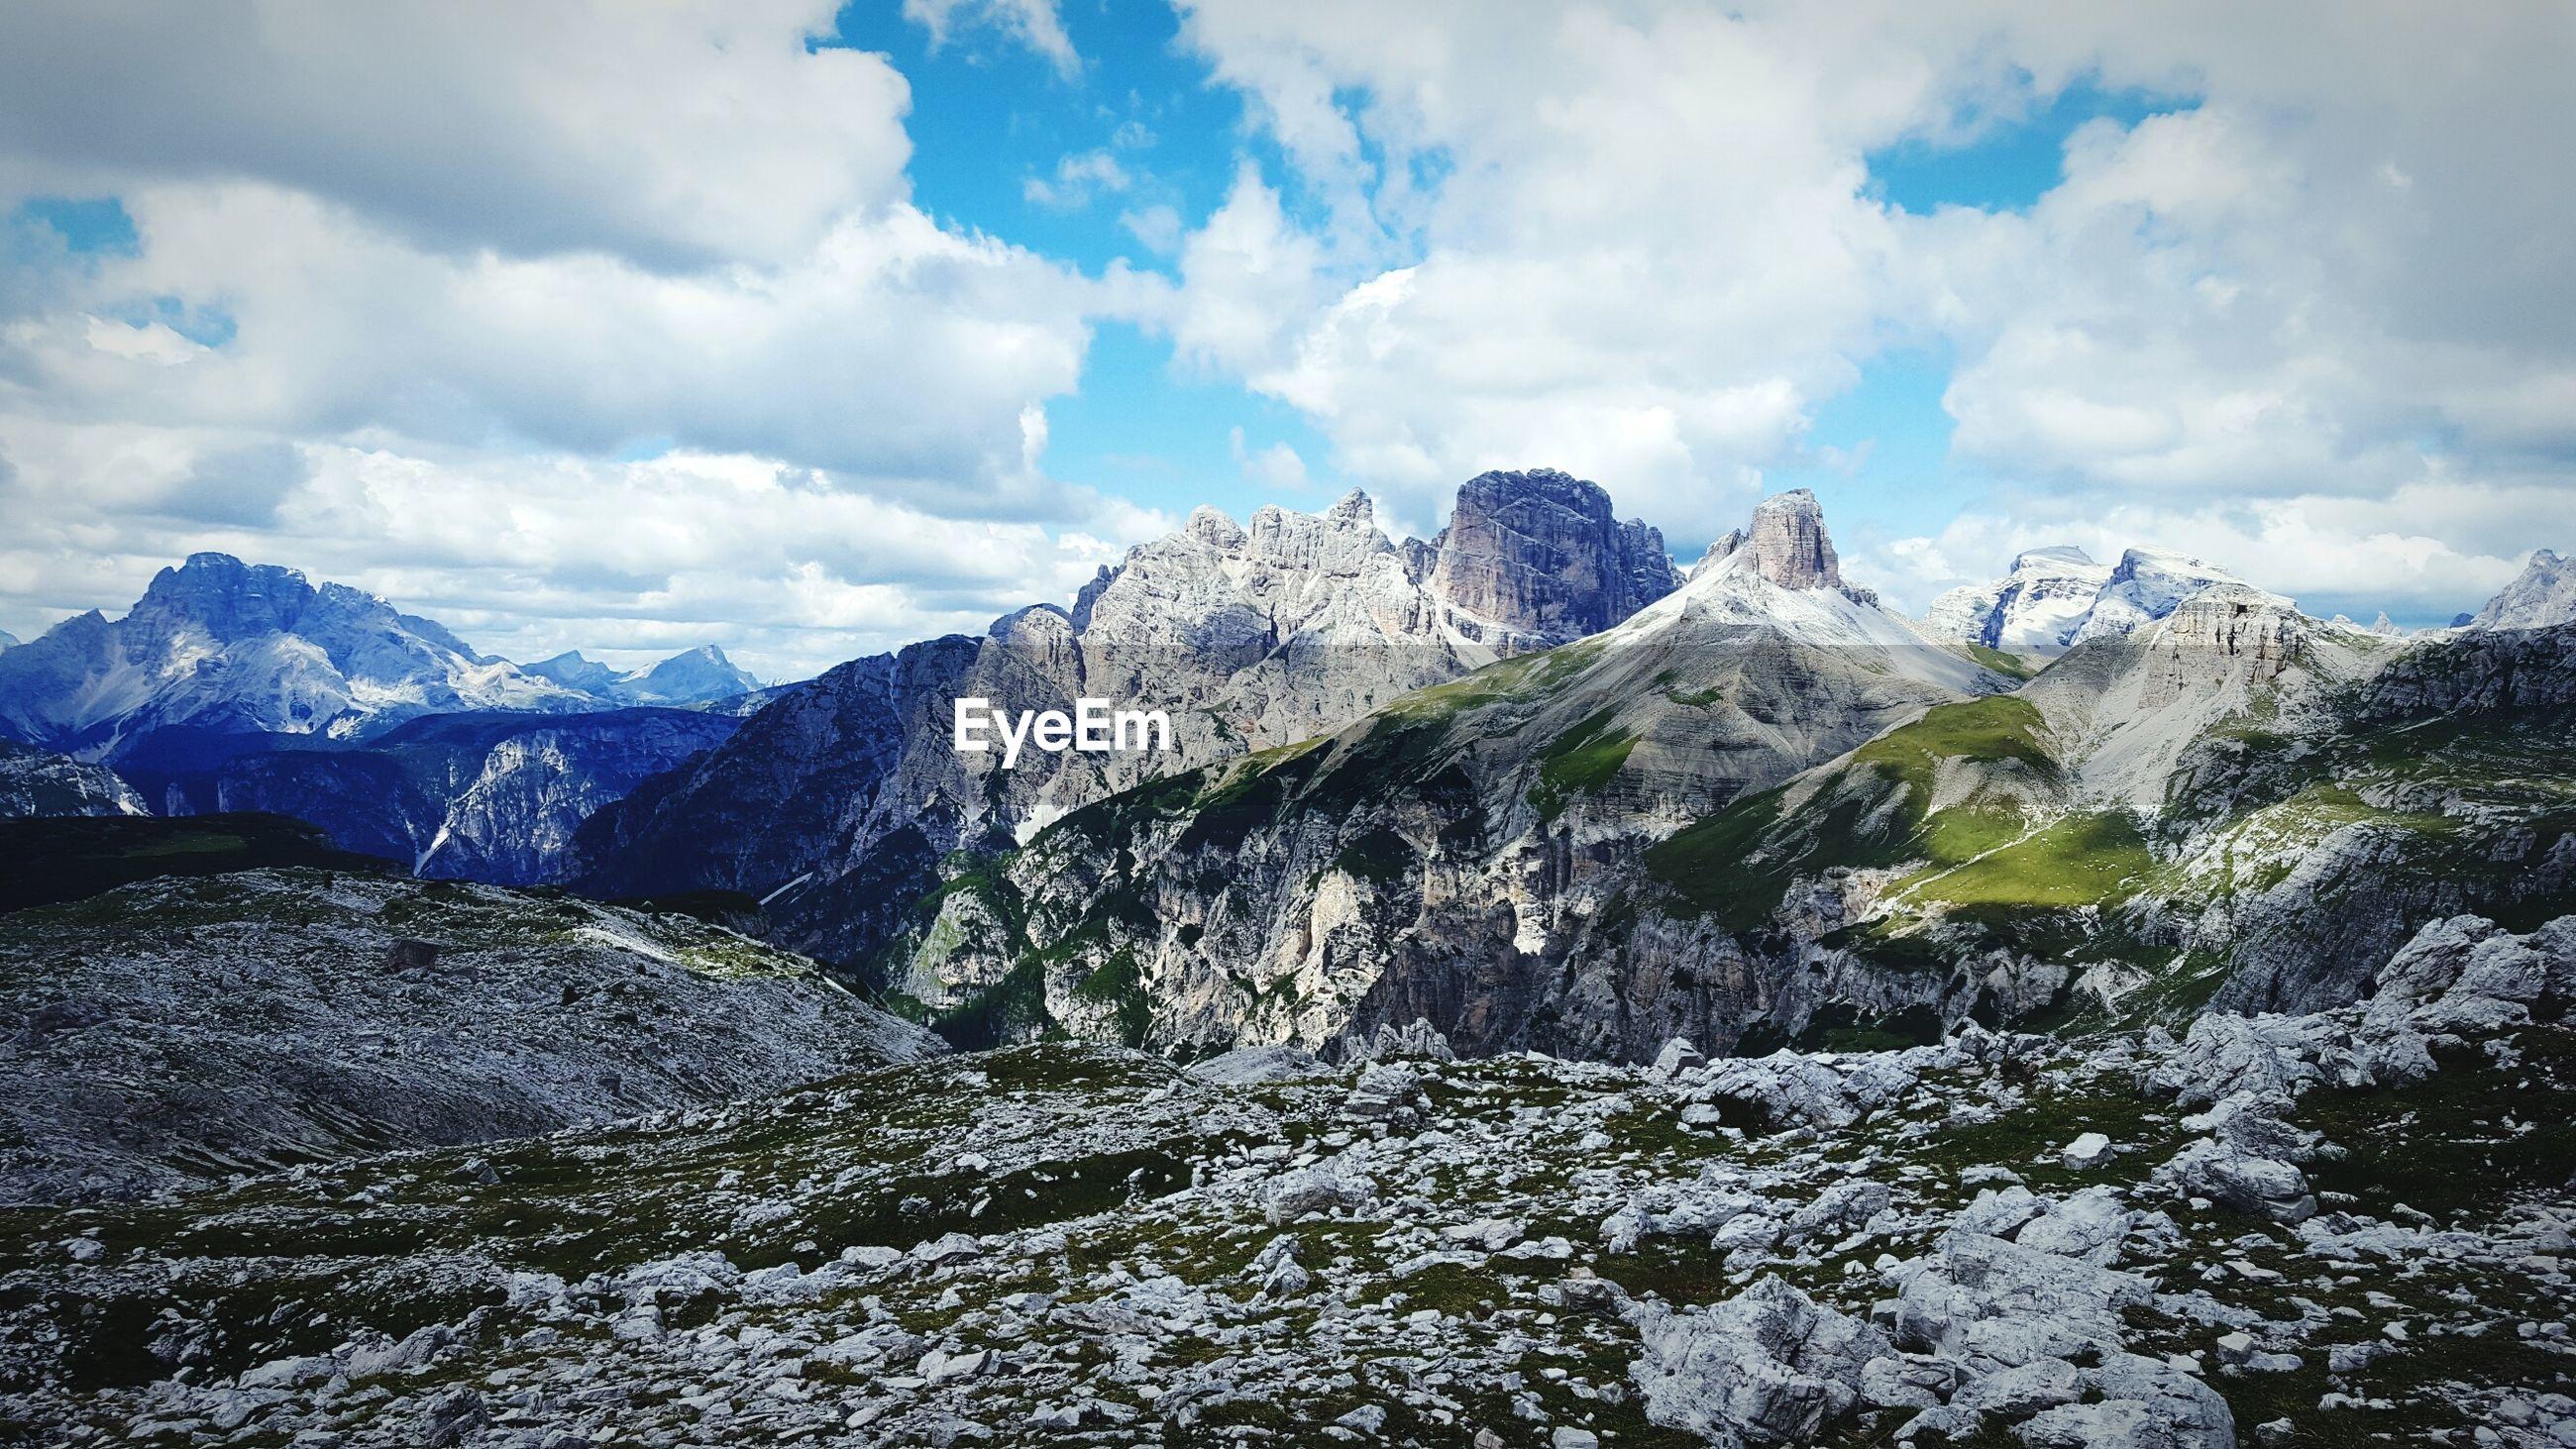 Distant view of tre cime di lavaredo against cloudy sky